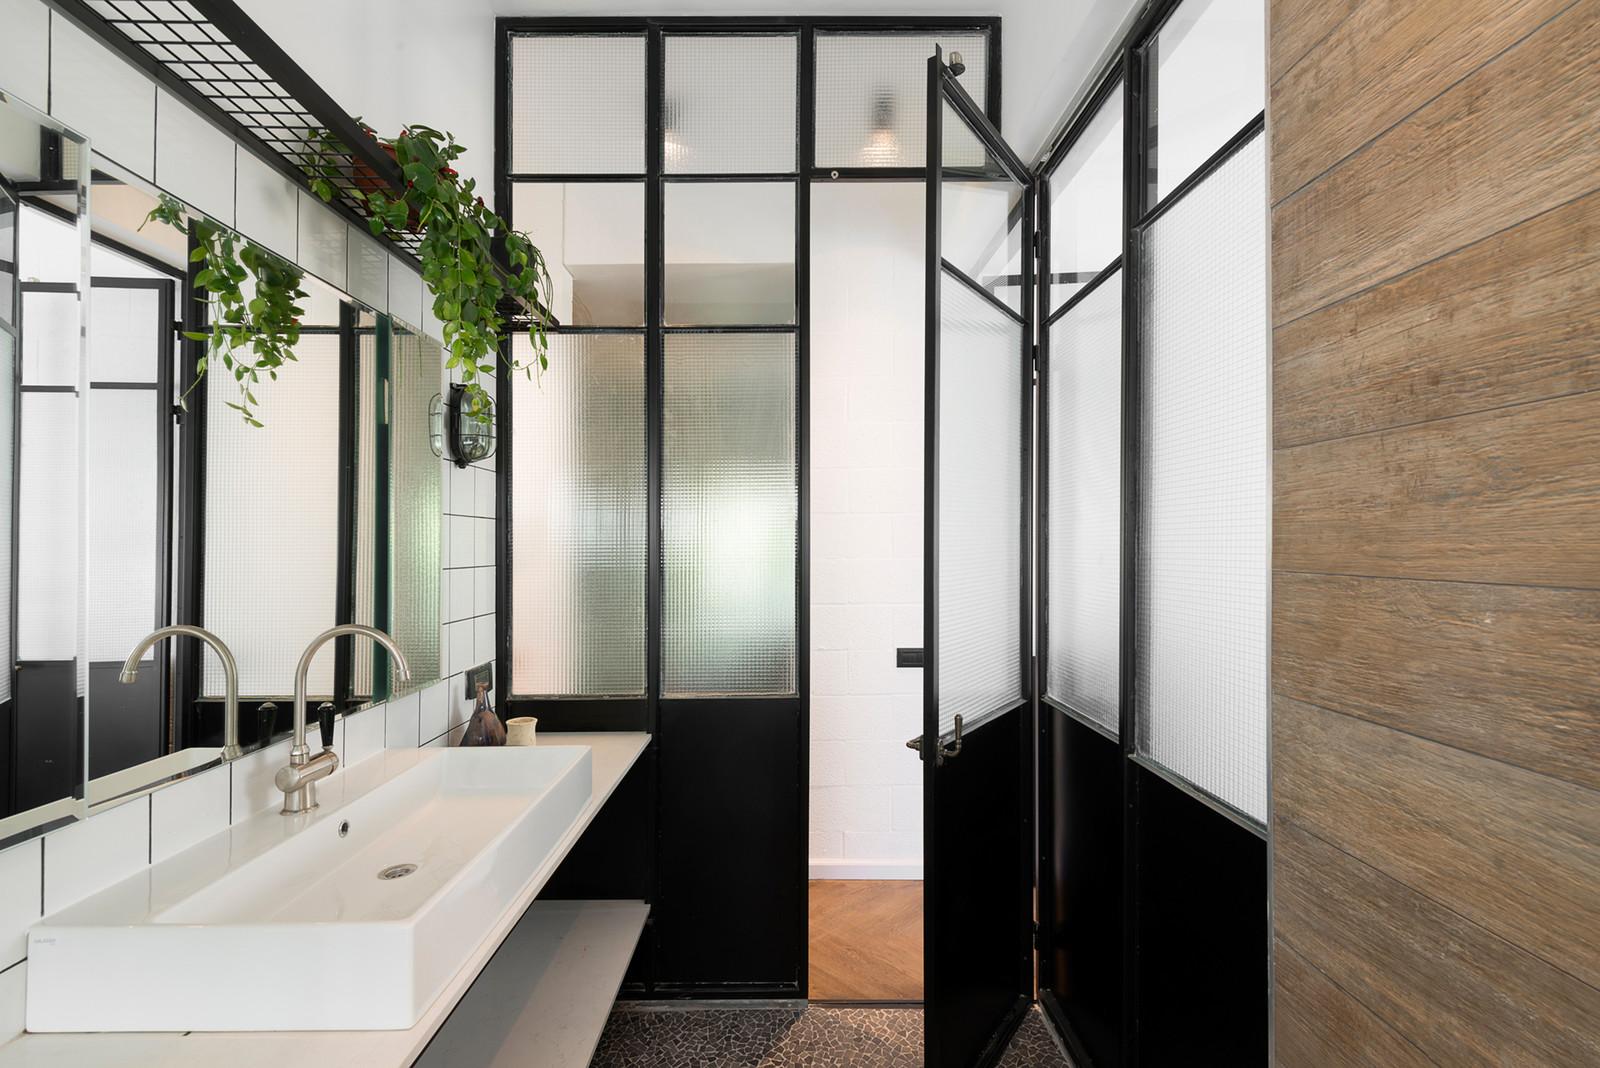 Apartment-renovation-just3ds.com-23